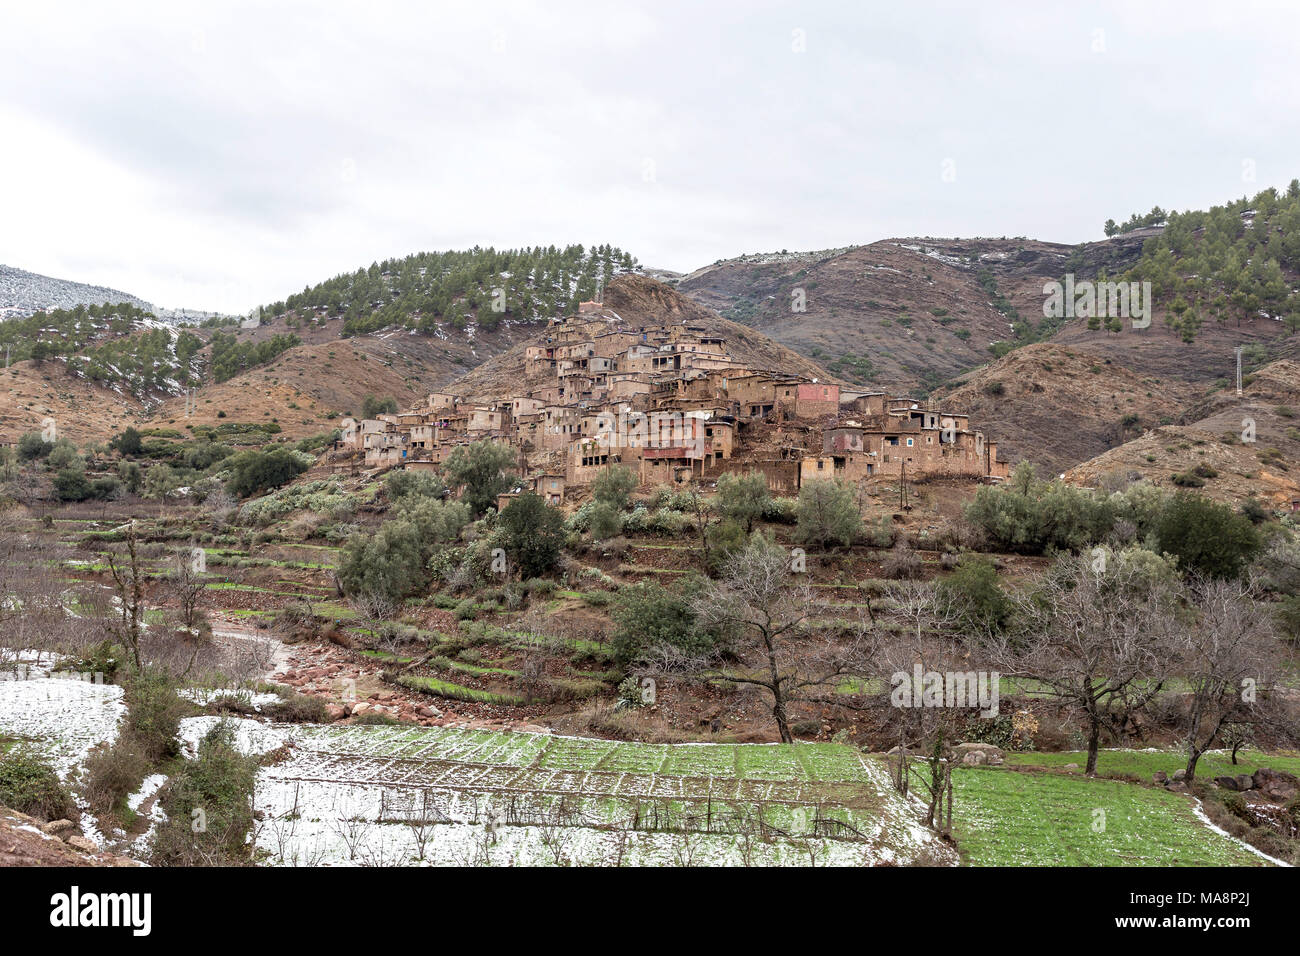 Visit to Ourika Valley, Atlas mountains, Morroco - Stock Image